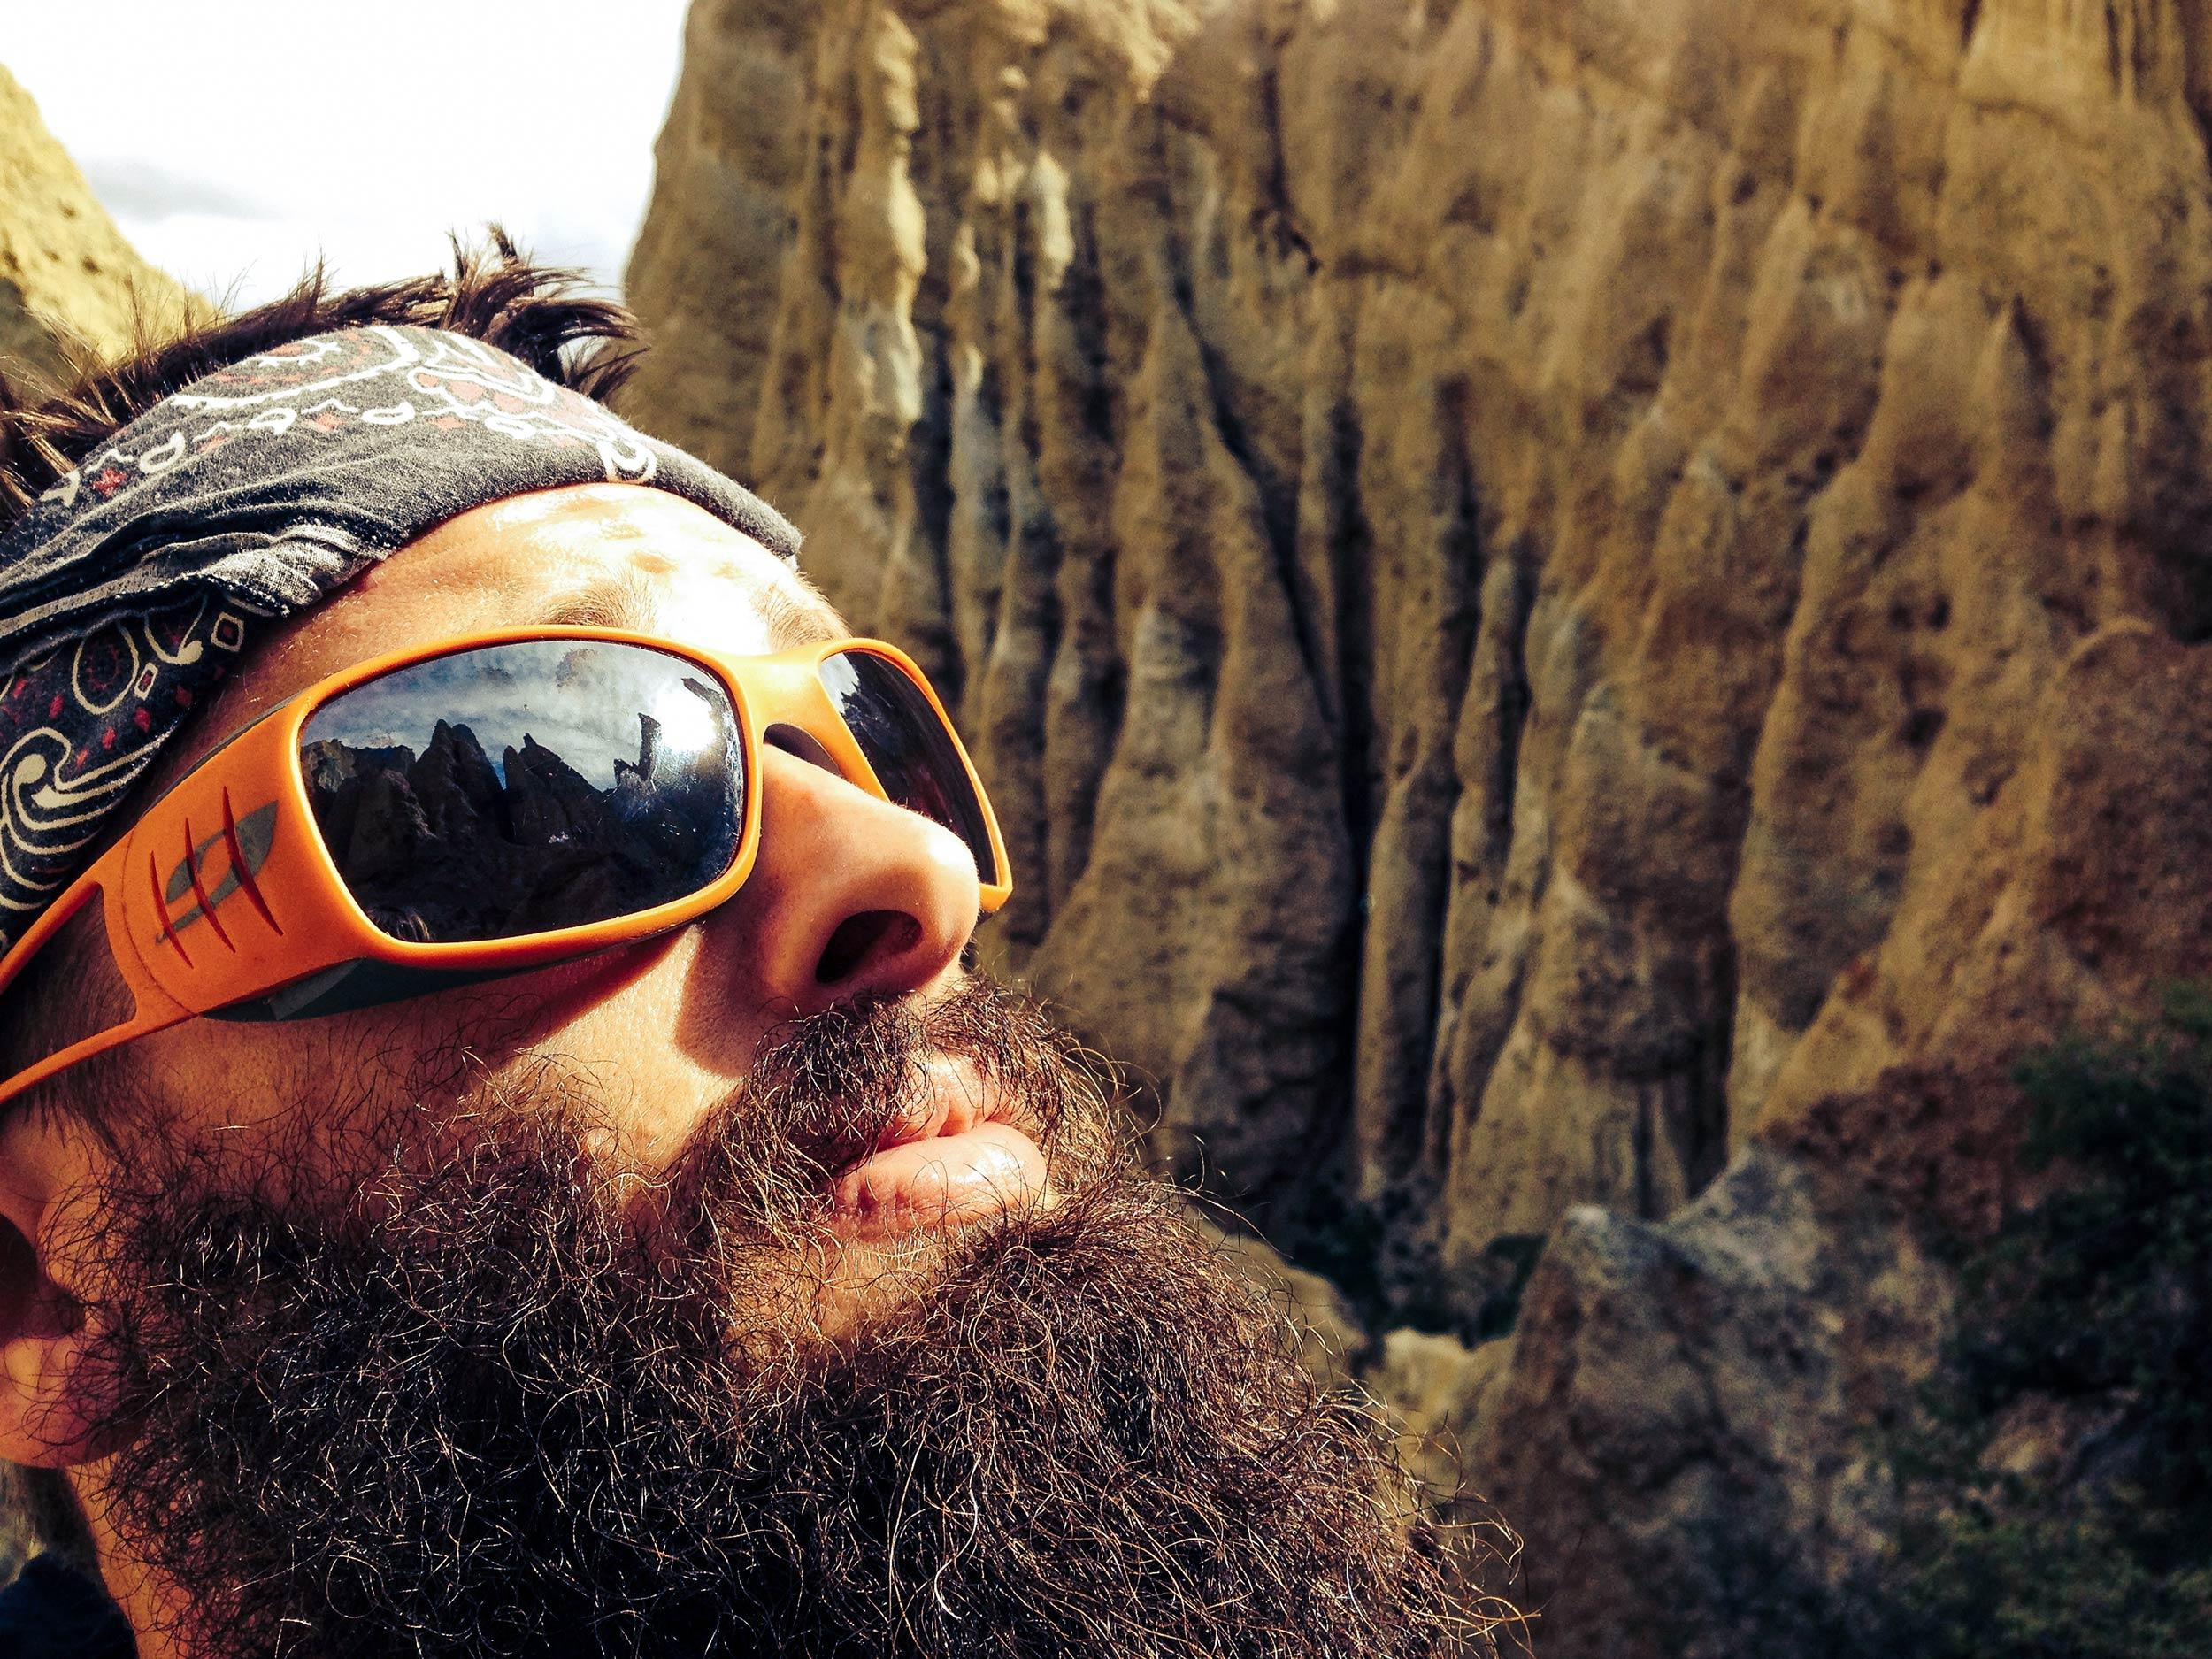 omarama_clay_cliffs_jordan_looking_up.jpg